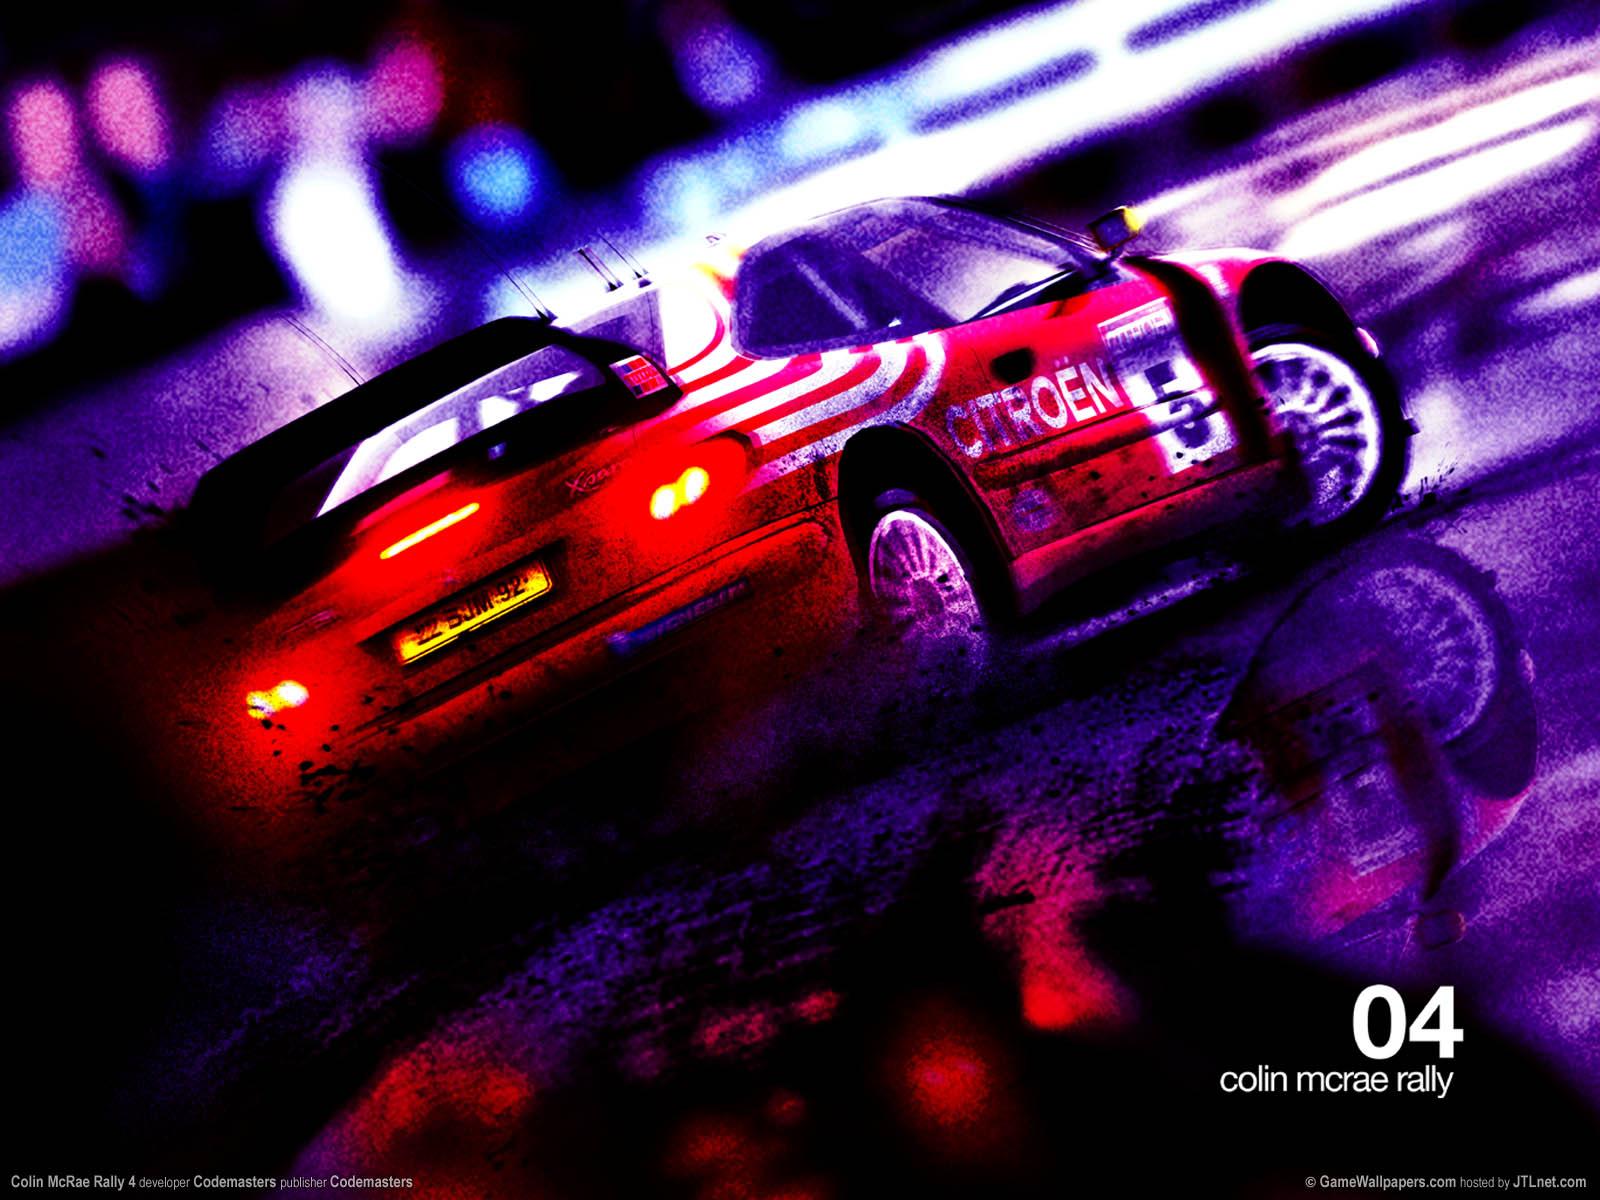 Colin McRae Rally 4 Hintergrundbild 02 1600x1200